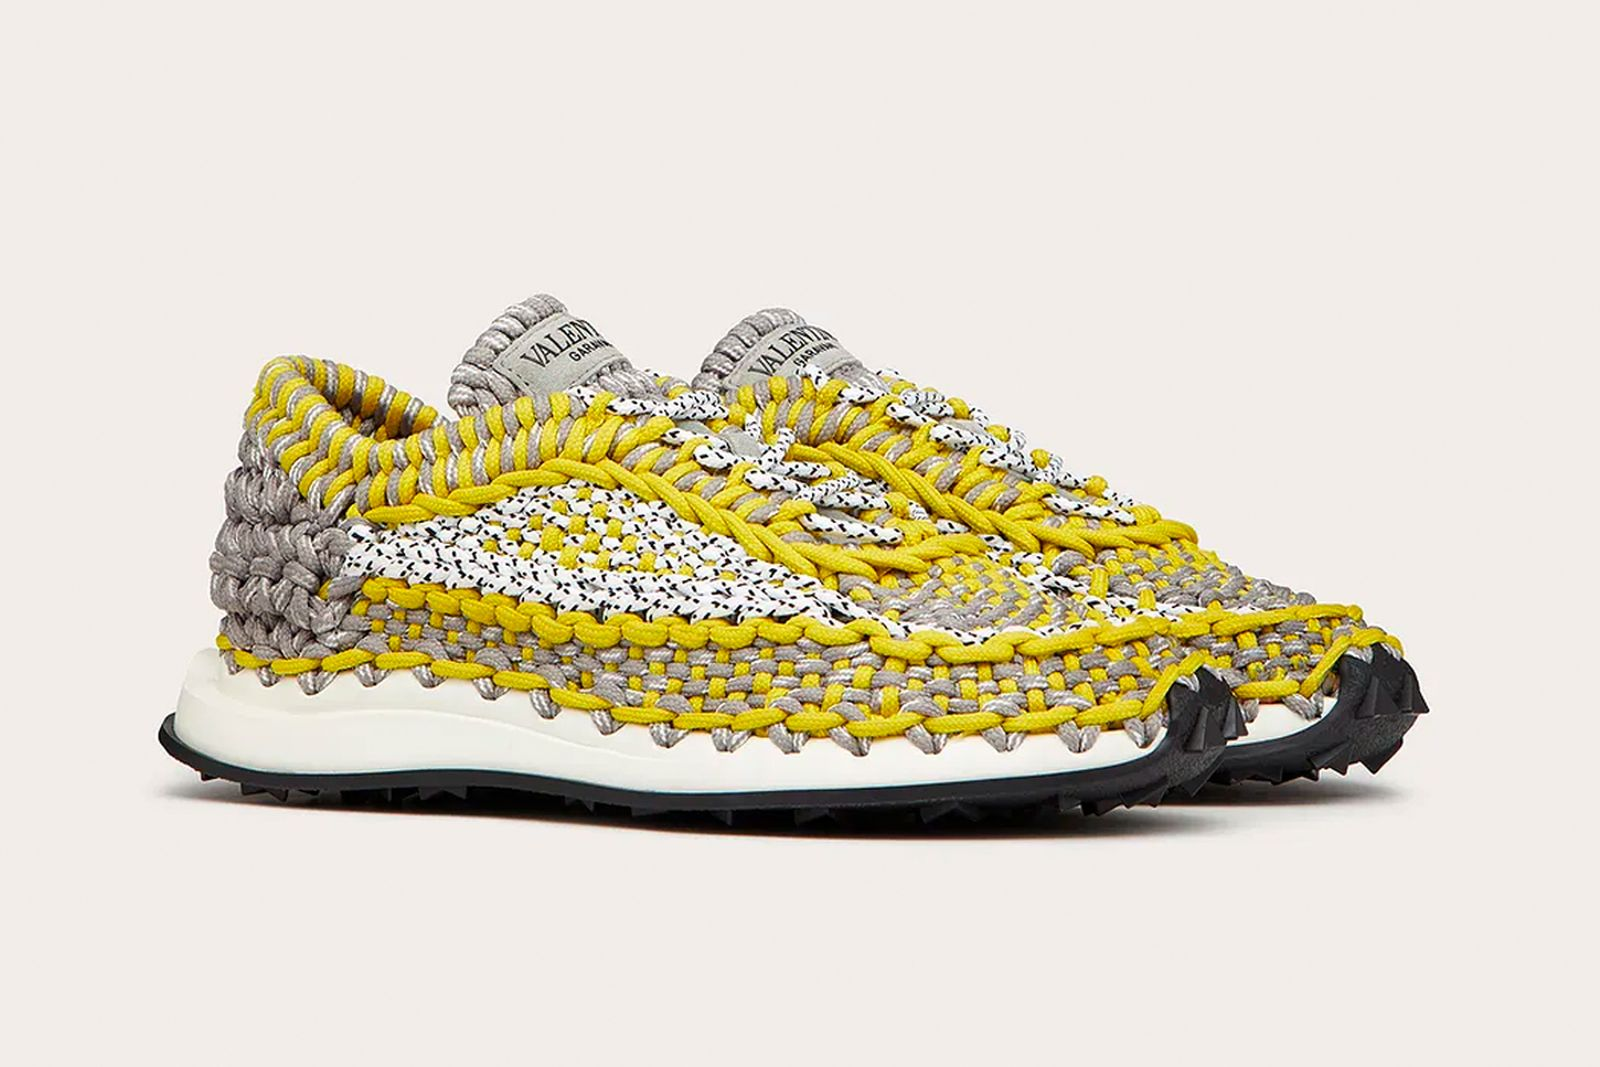 valentino-garavani-crochet-sneakers-release-date-price-06